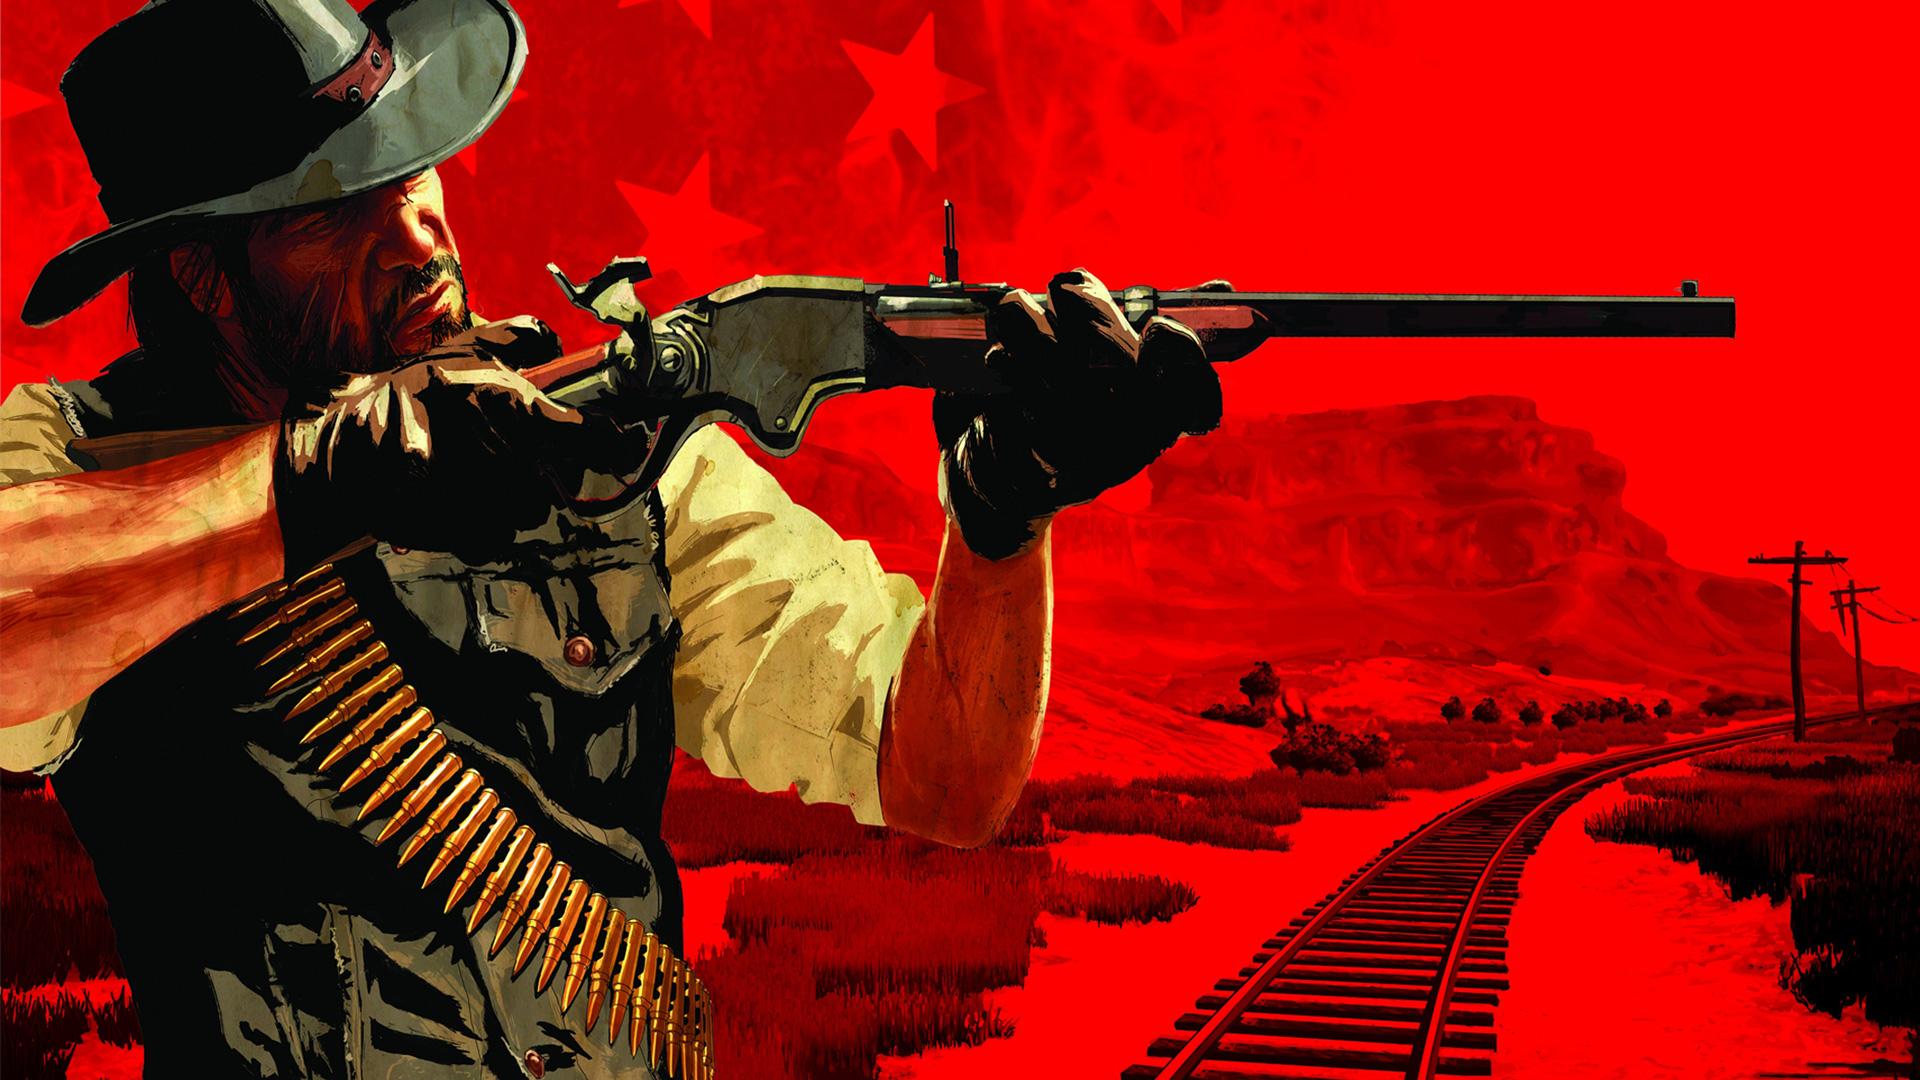 Red Dead Redemption 2 Hd Wallpaper